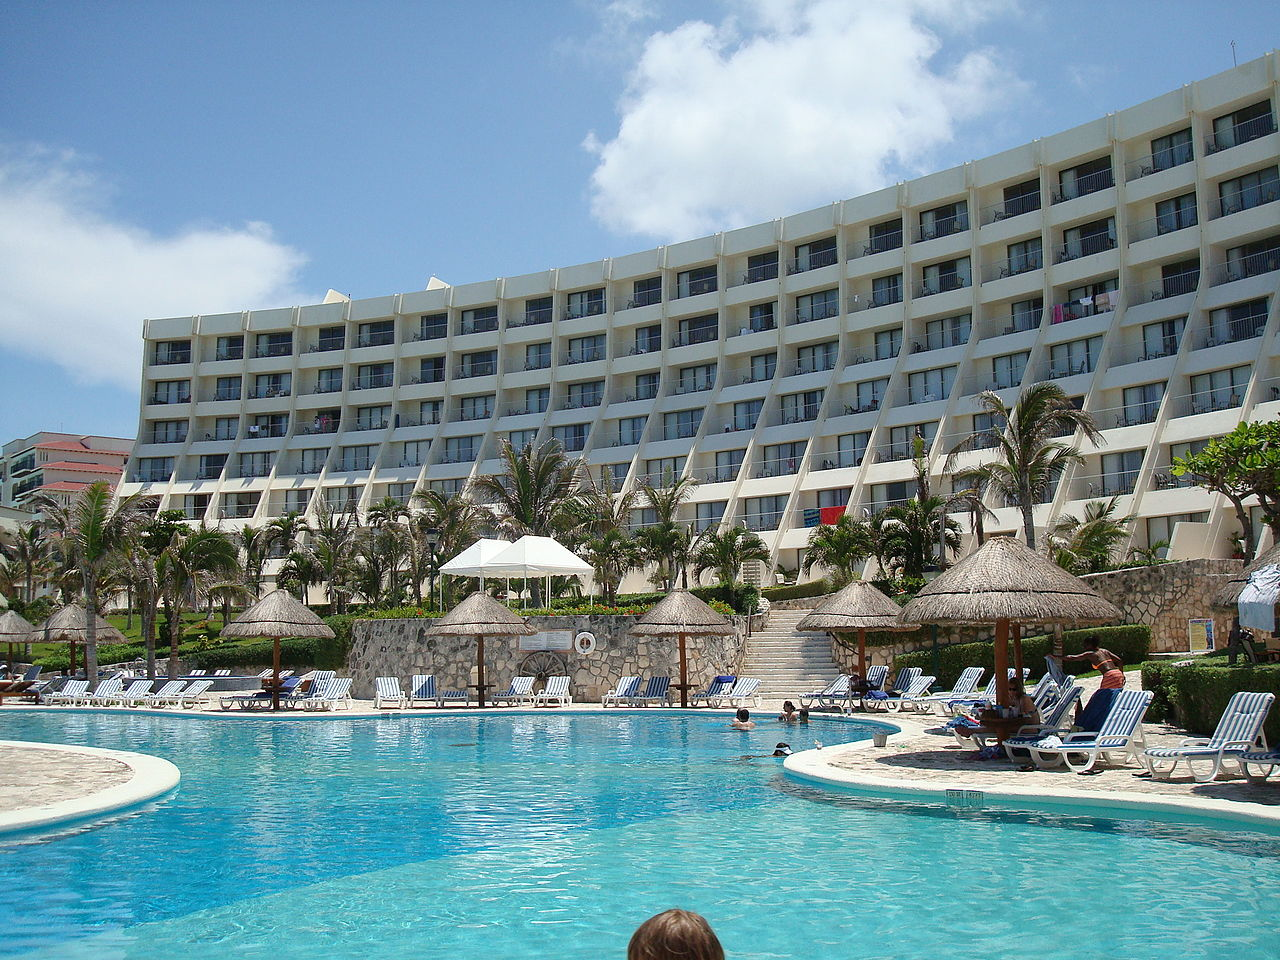 1280px-Cancun_Caribe